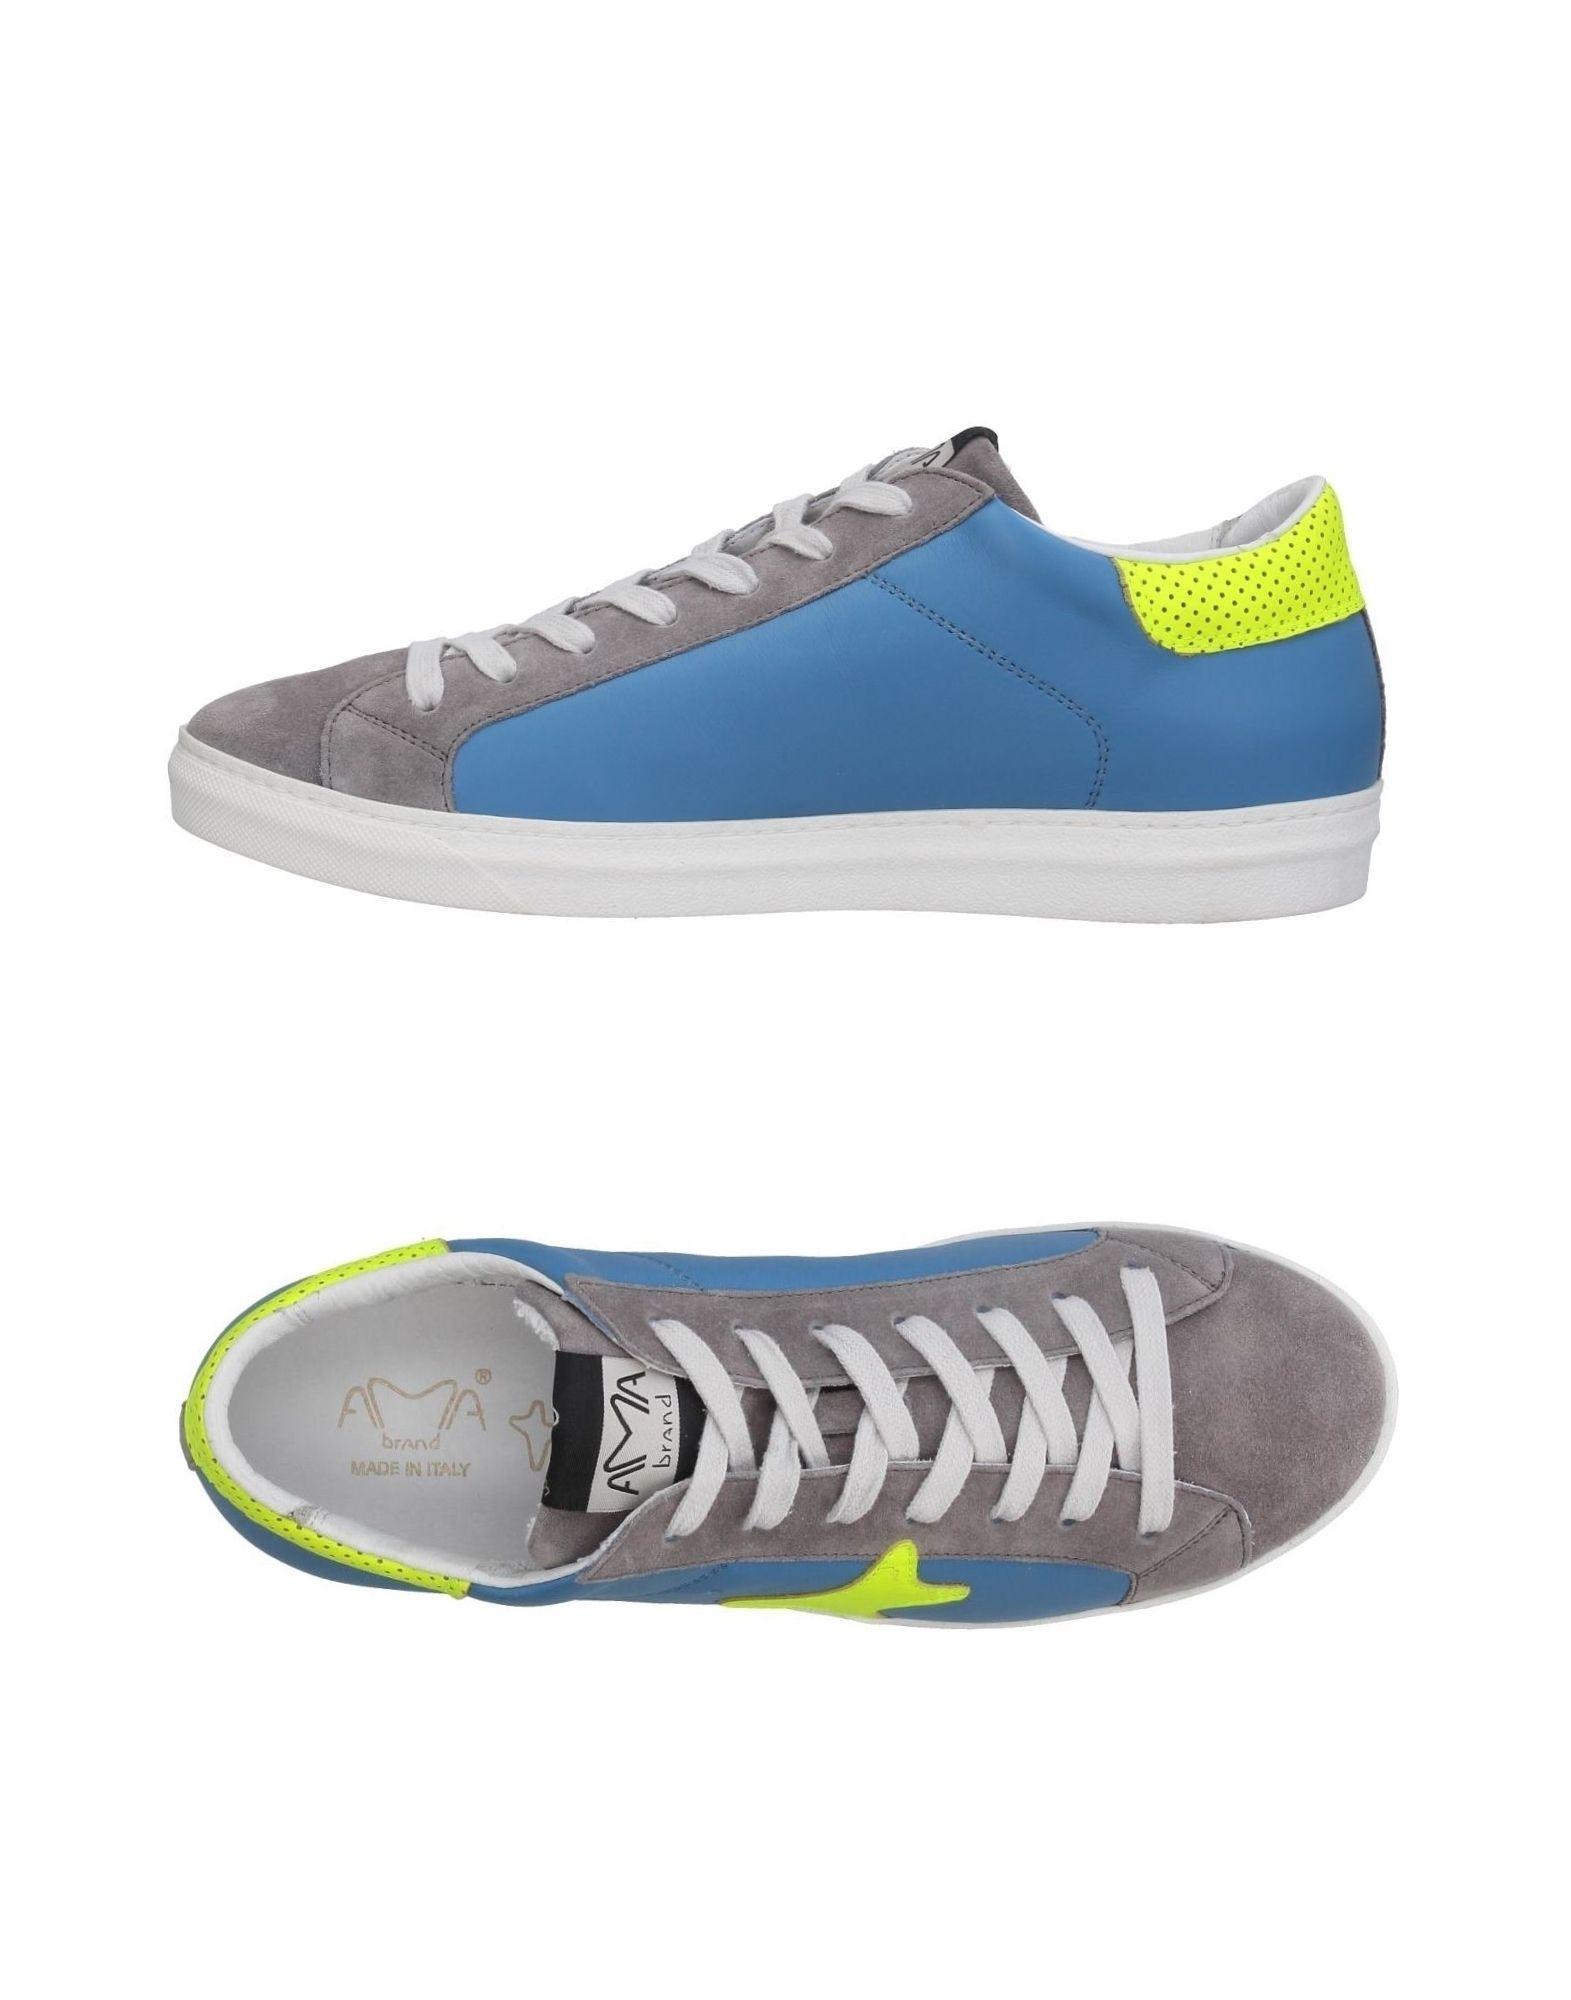 Ama Brand Sneakers Herren  11401135AR Gute Qualität beliebte Schuhe